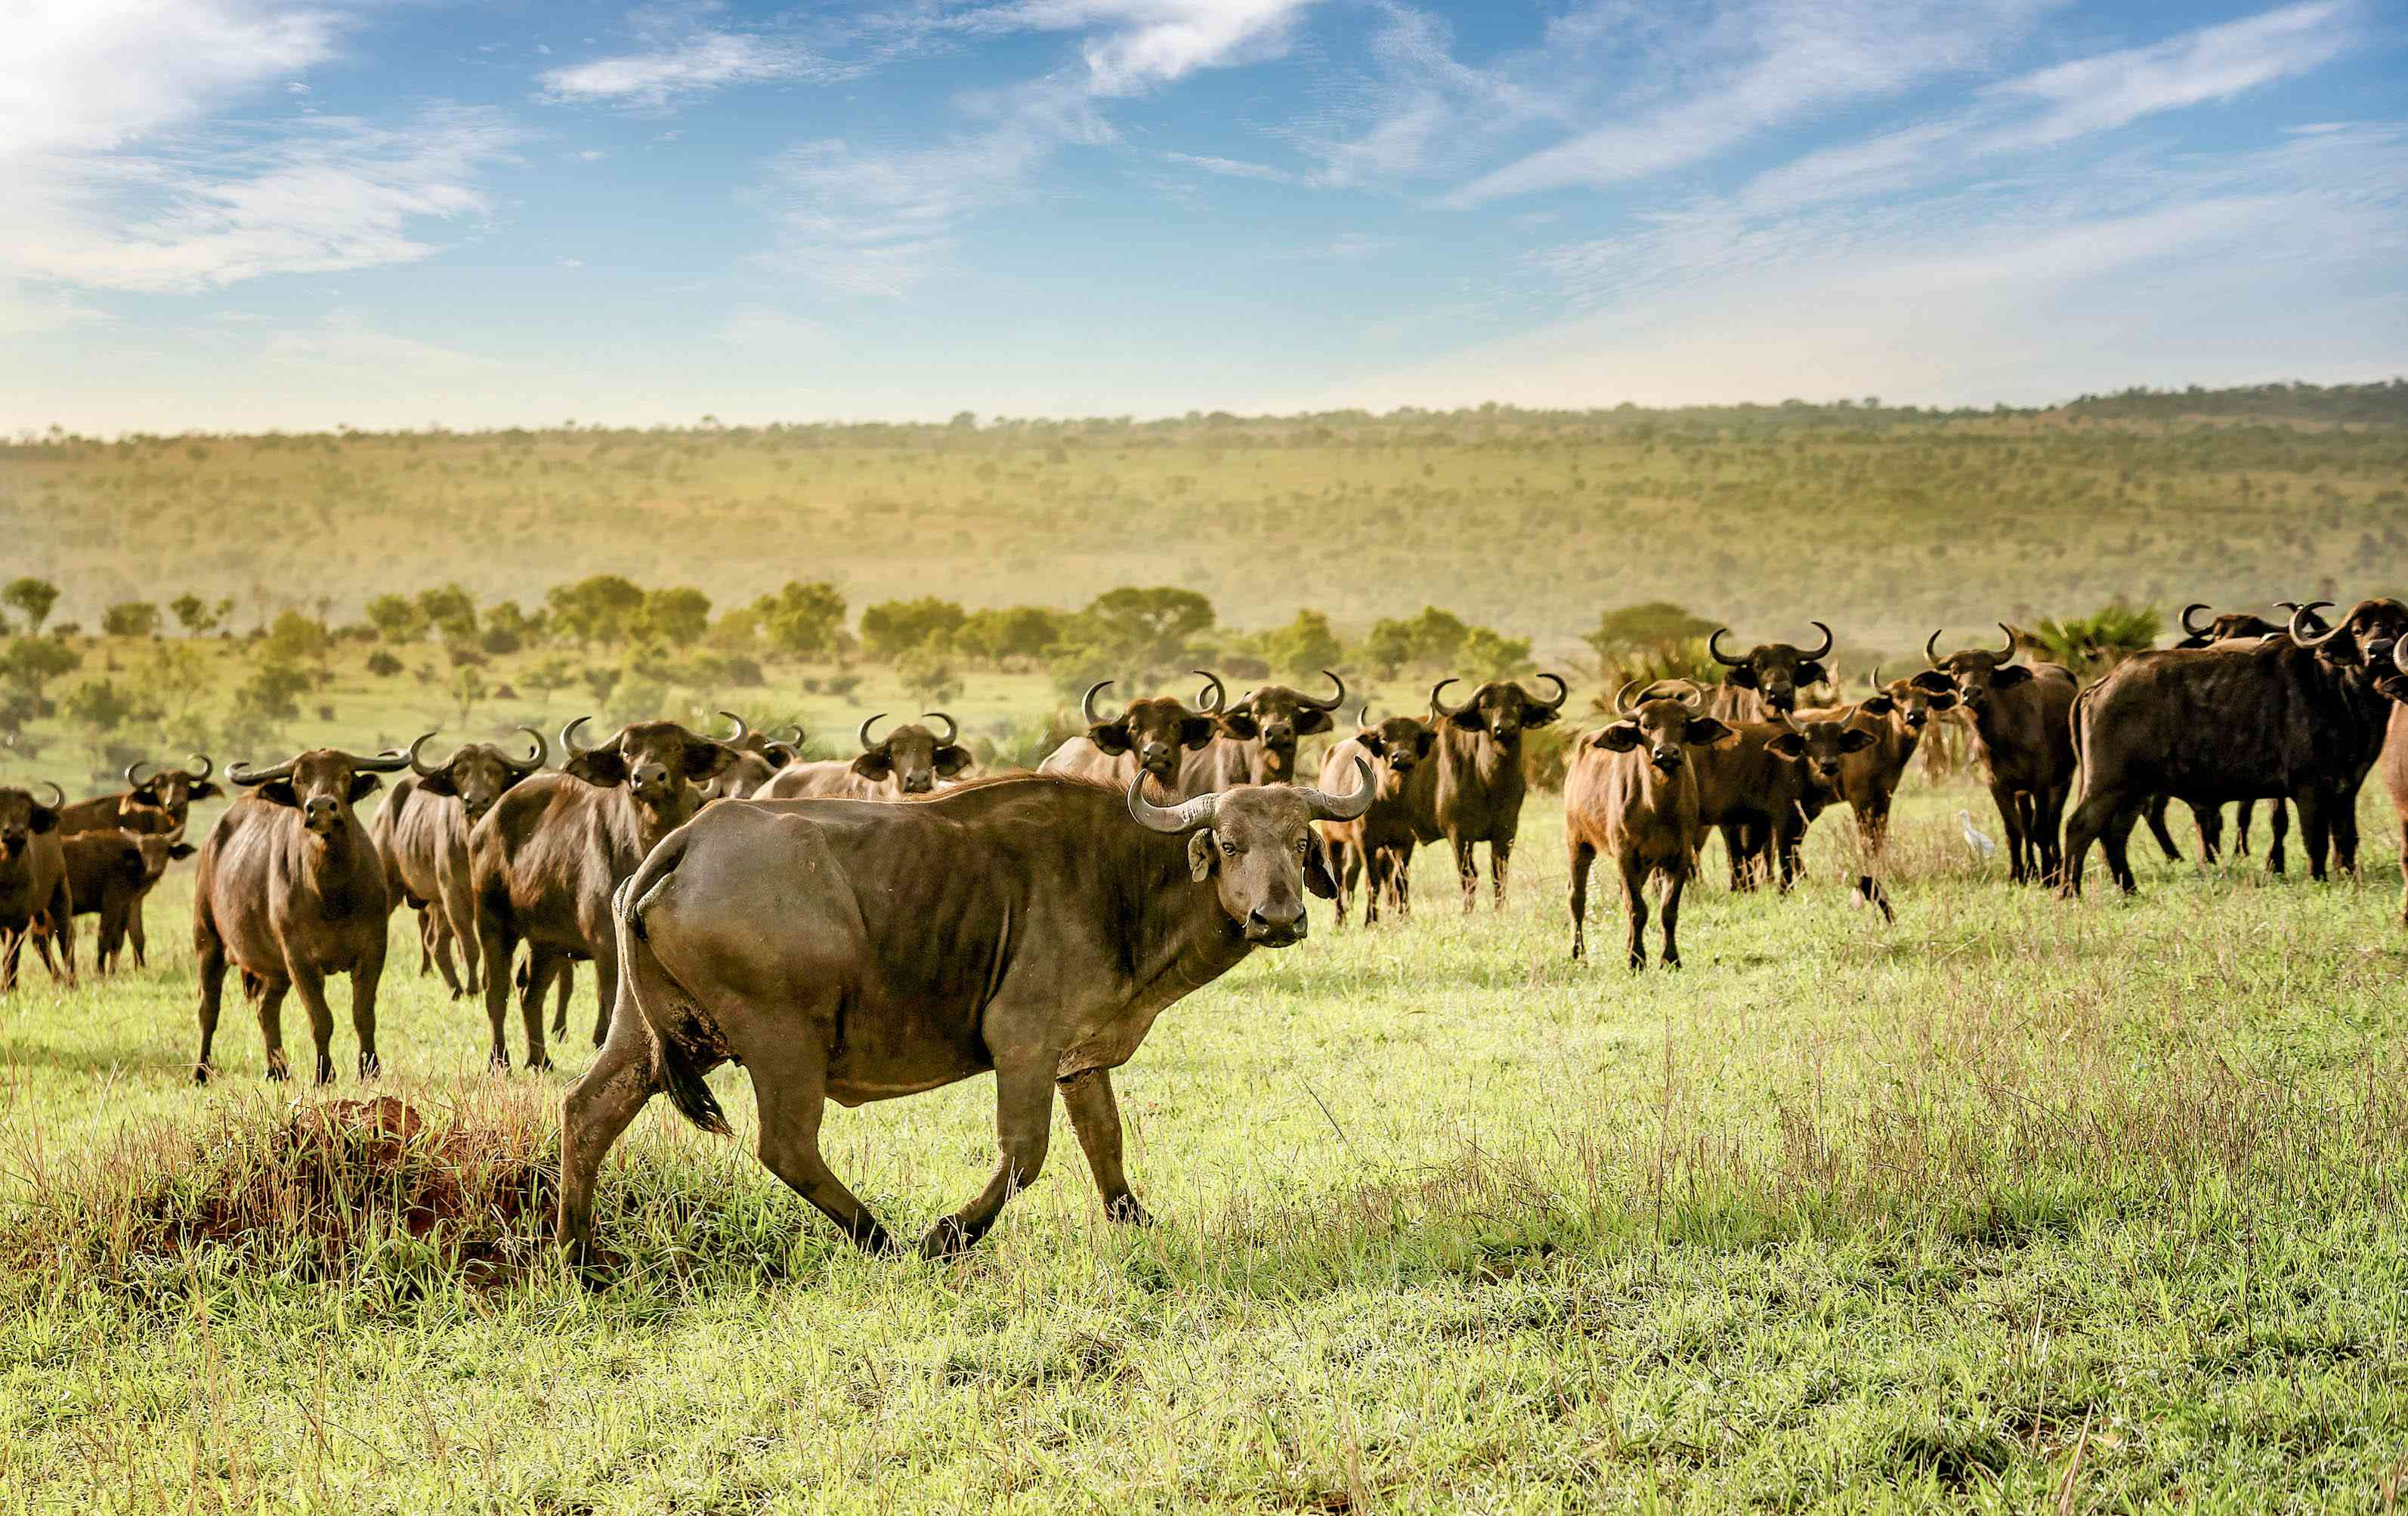 A herd of African buffalo on a plain.